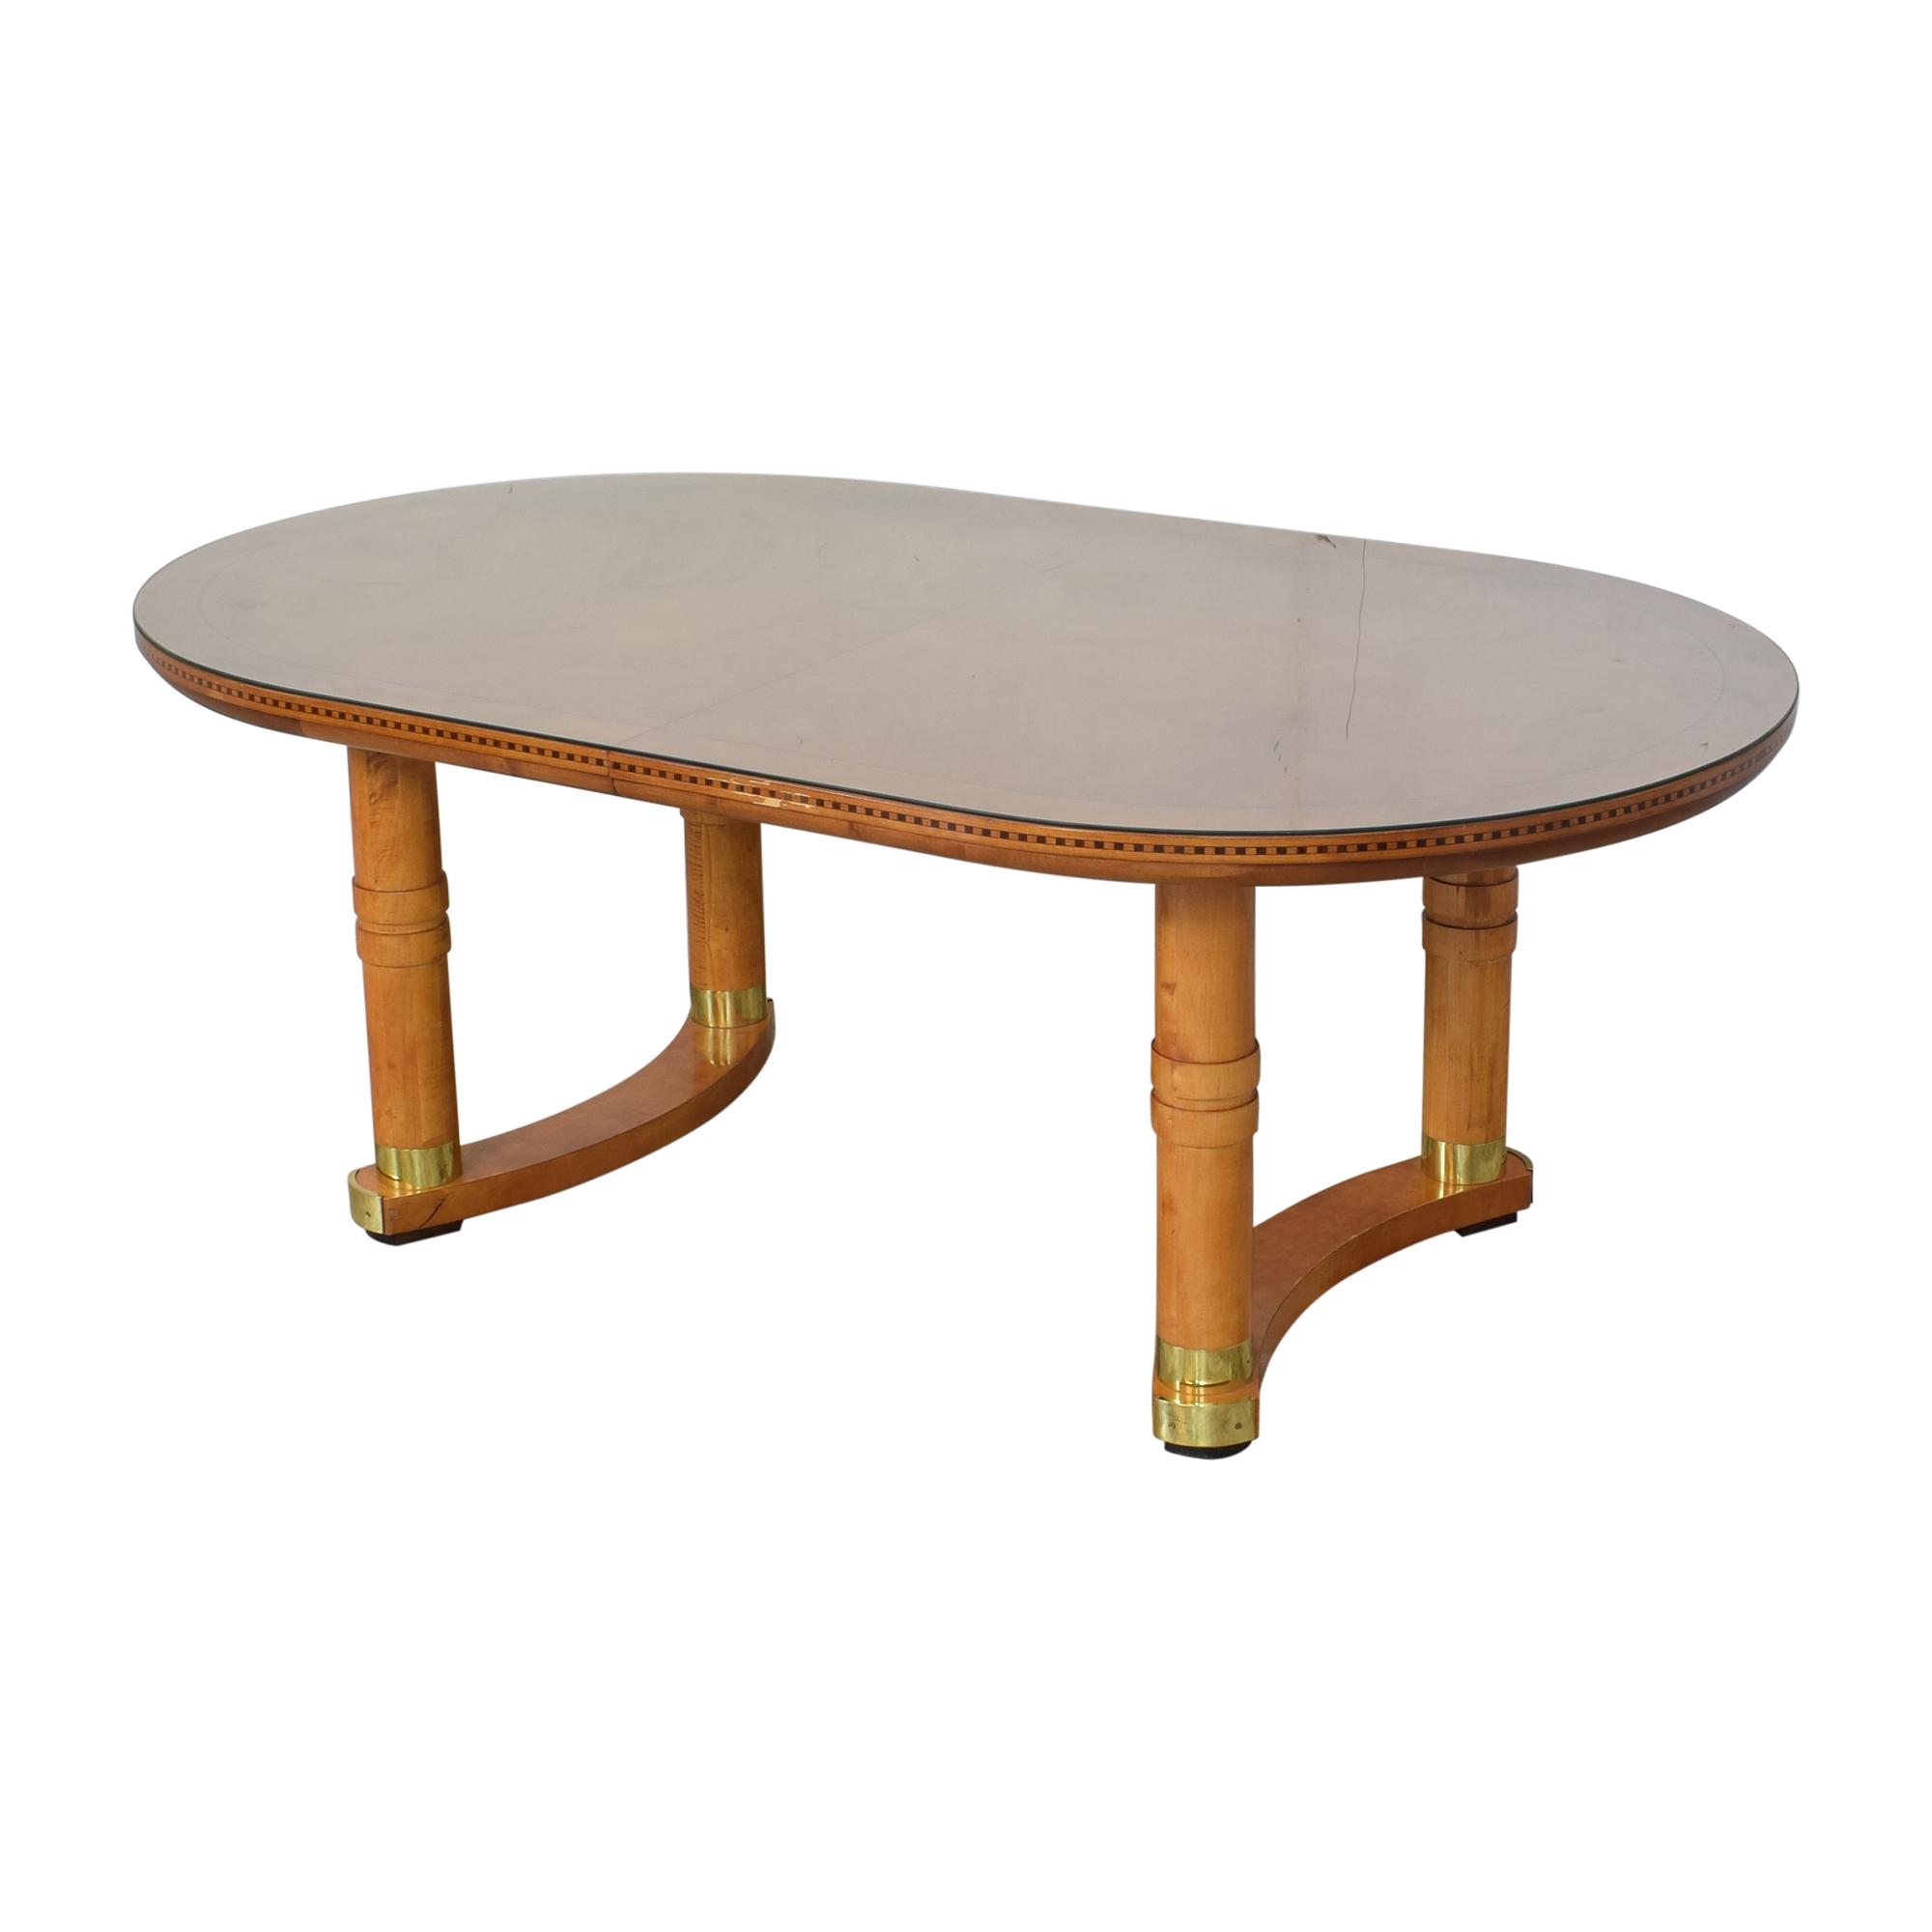 Huffman Koos Huffman Koos Extendable Dining Table Tables